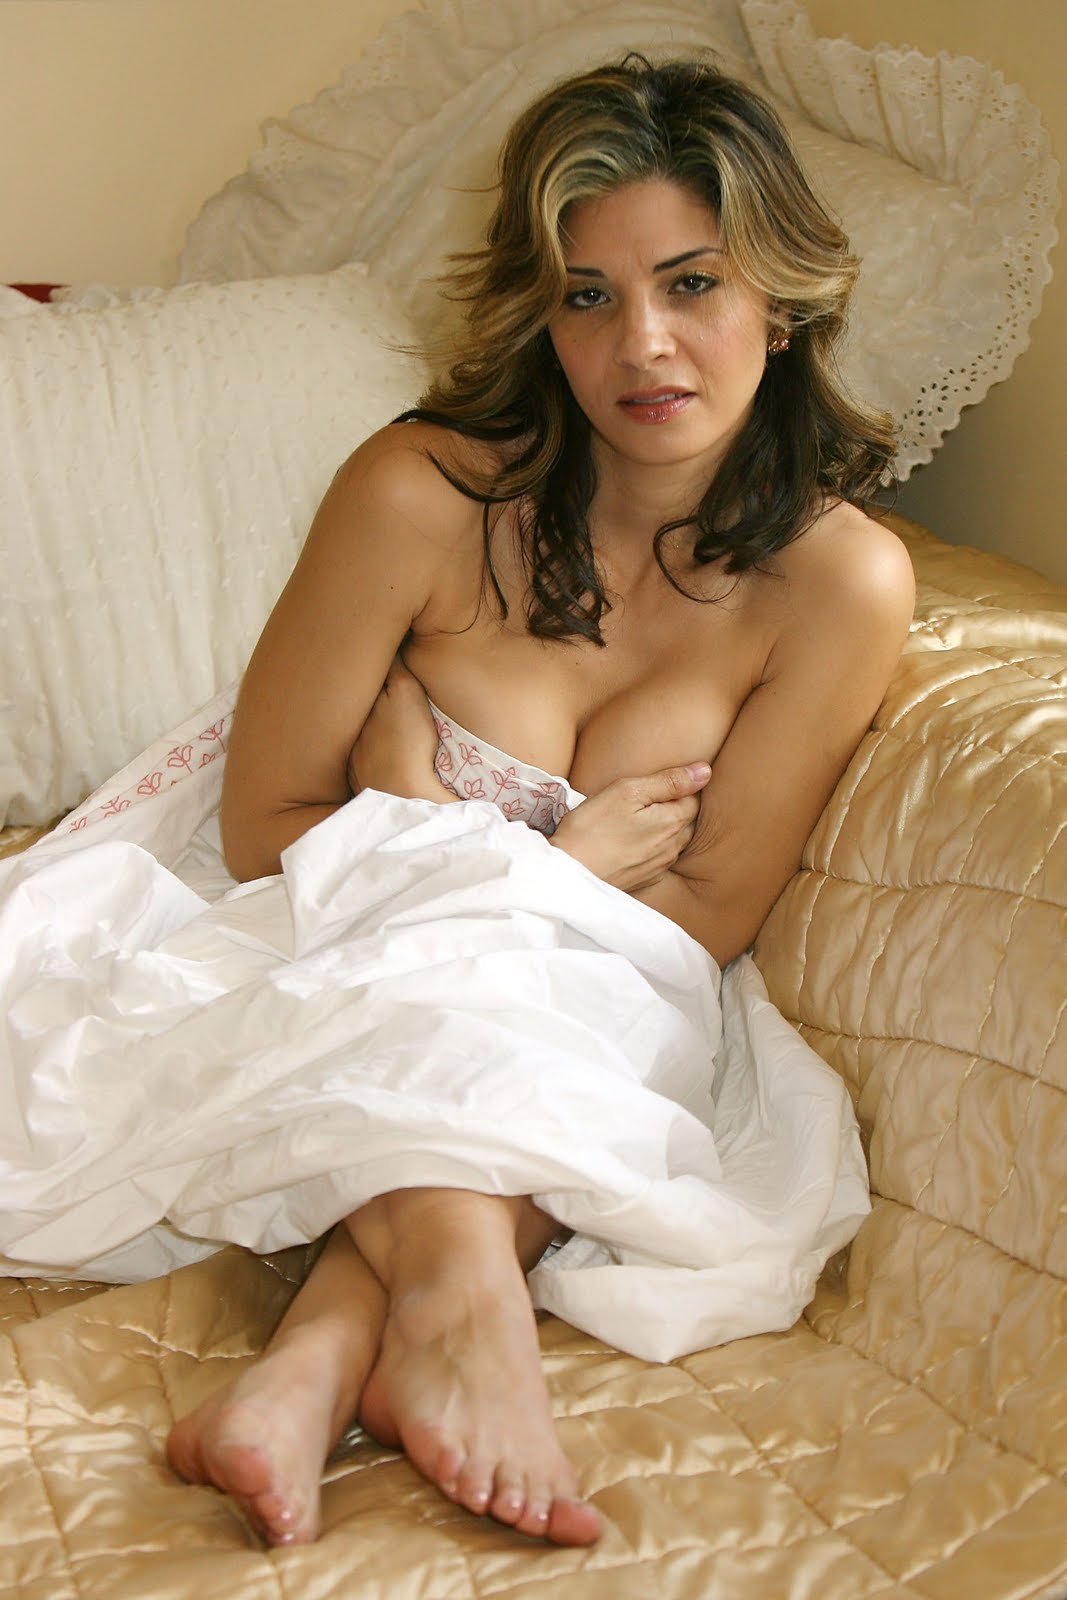 Callie thorne topless